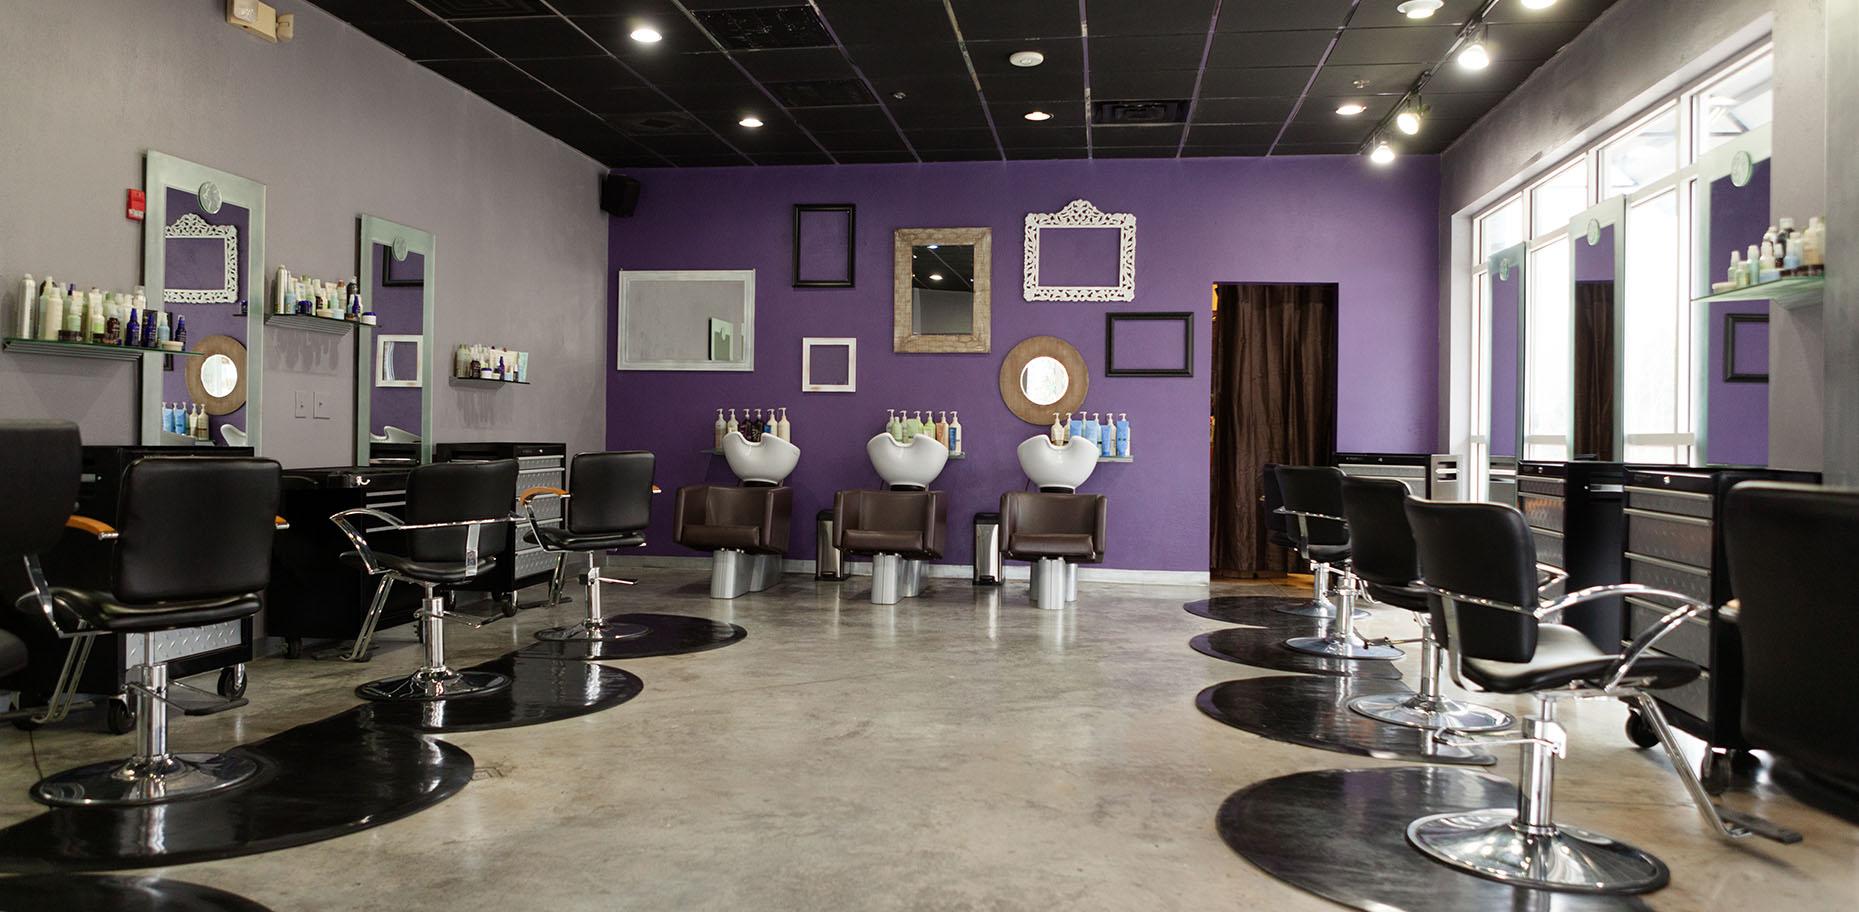 Finding a Good Hair Salon